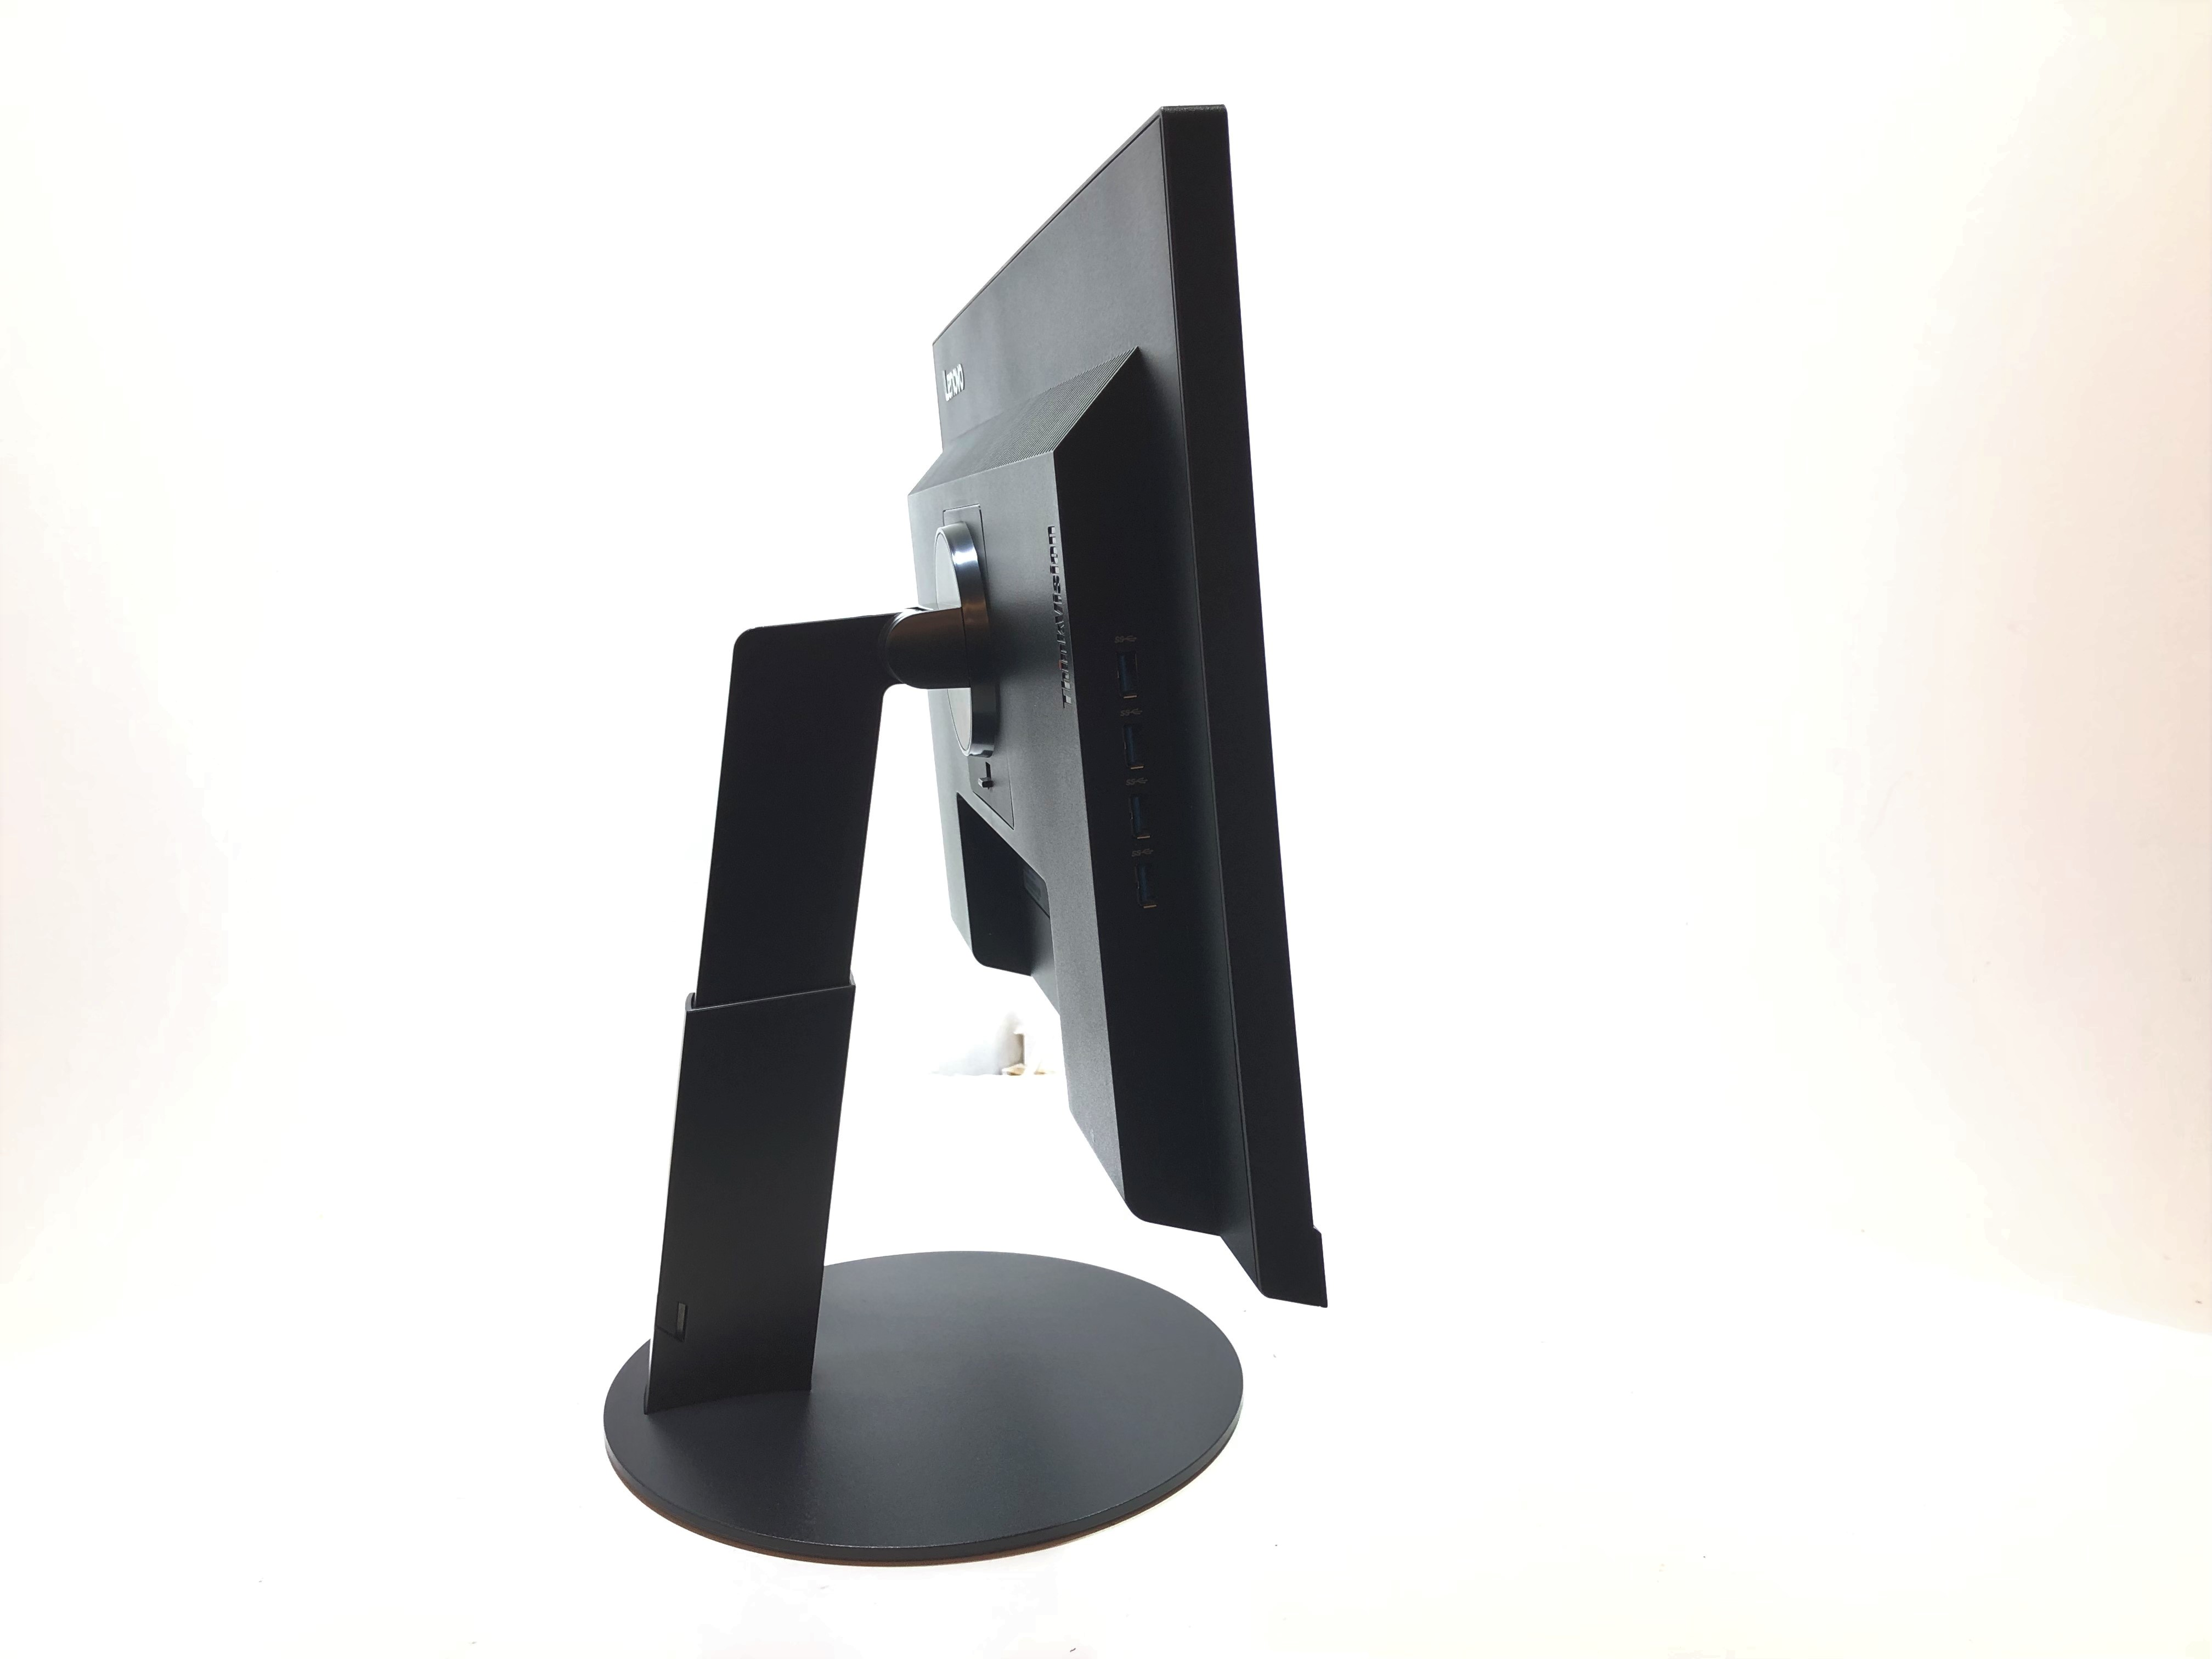 Lenovo ThinkVision T23i-10 No 3